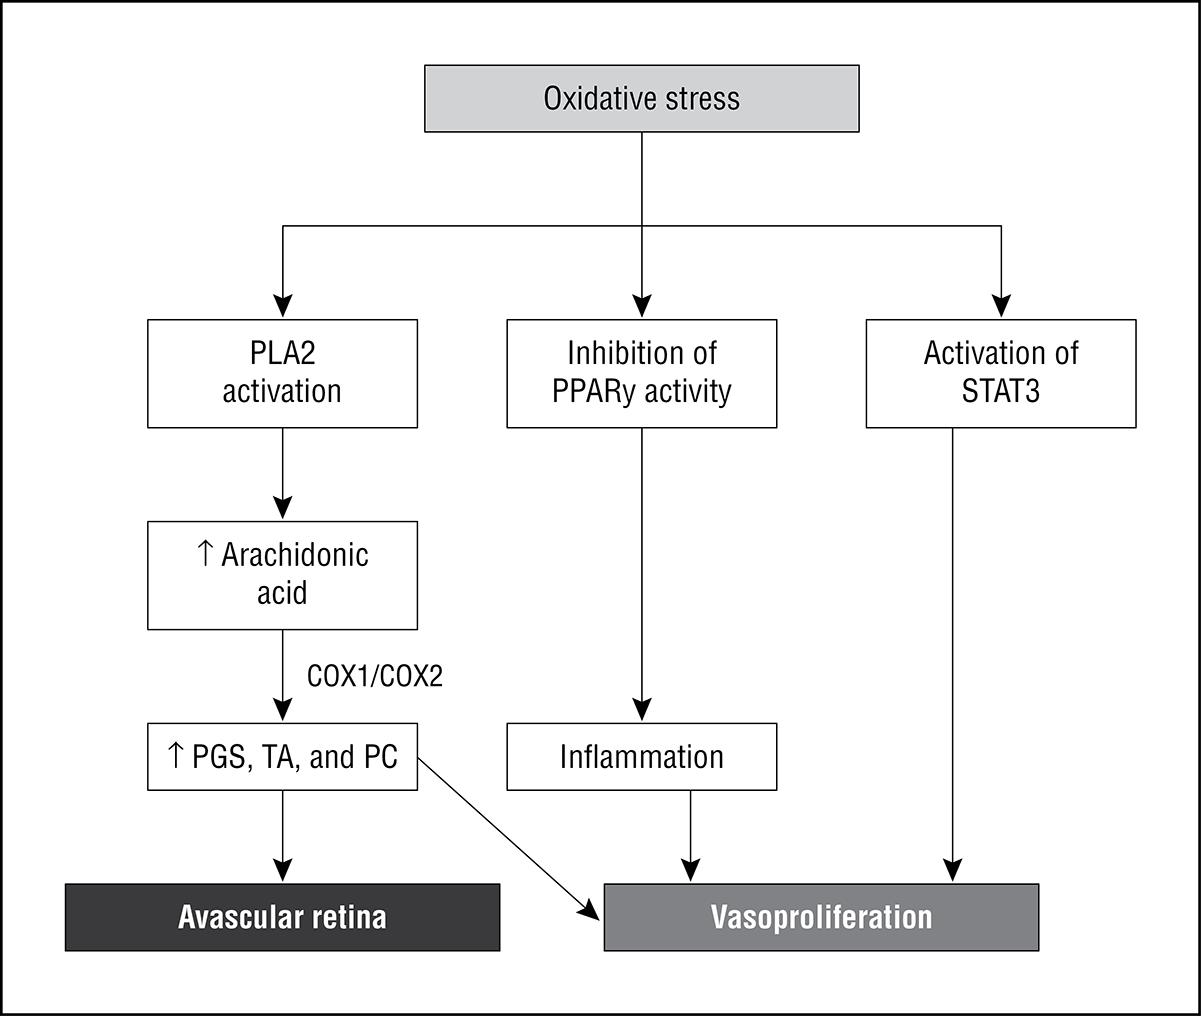 endothelial activation oxidative stress